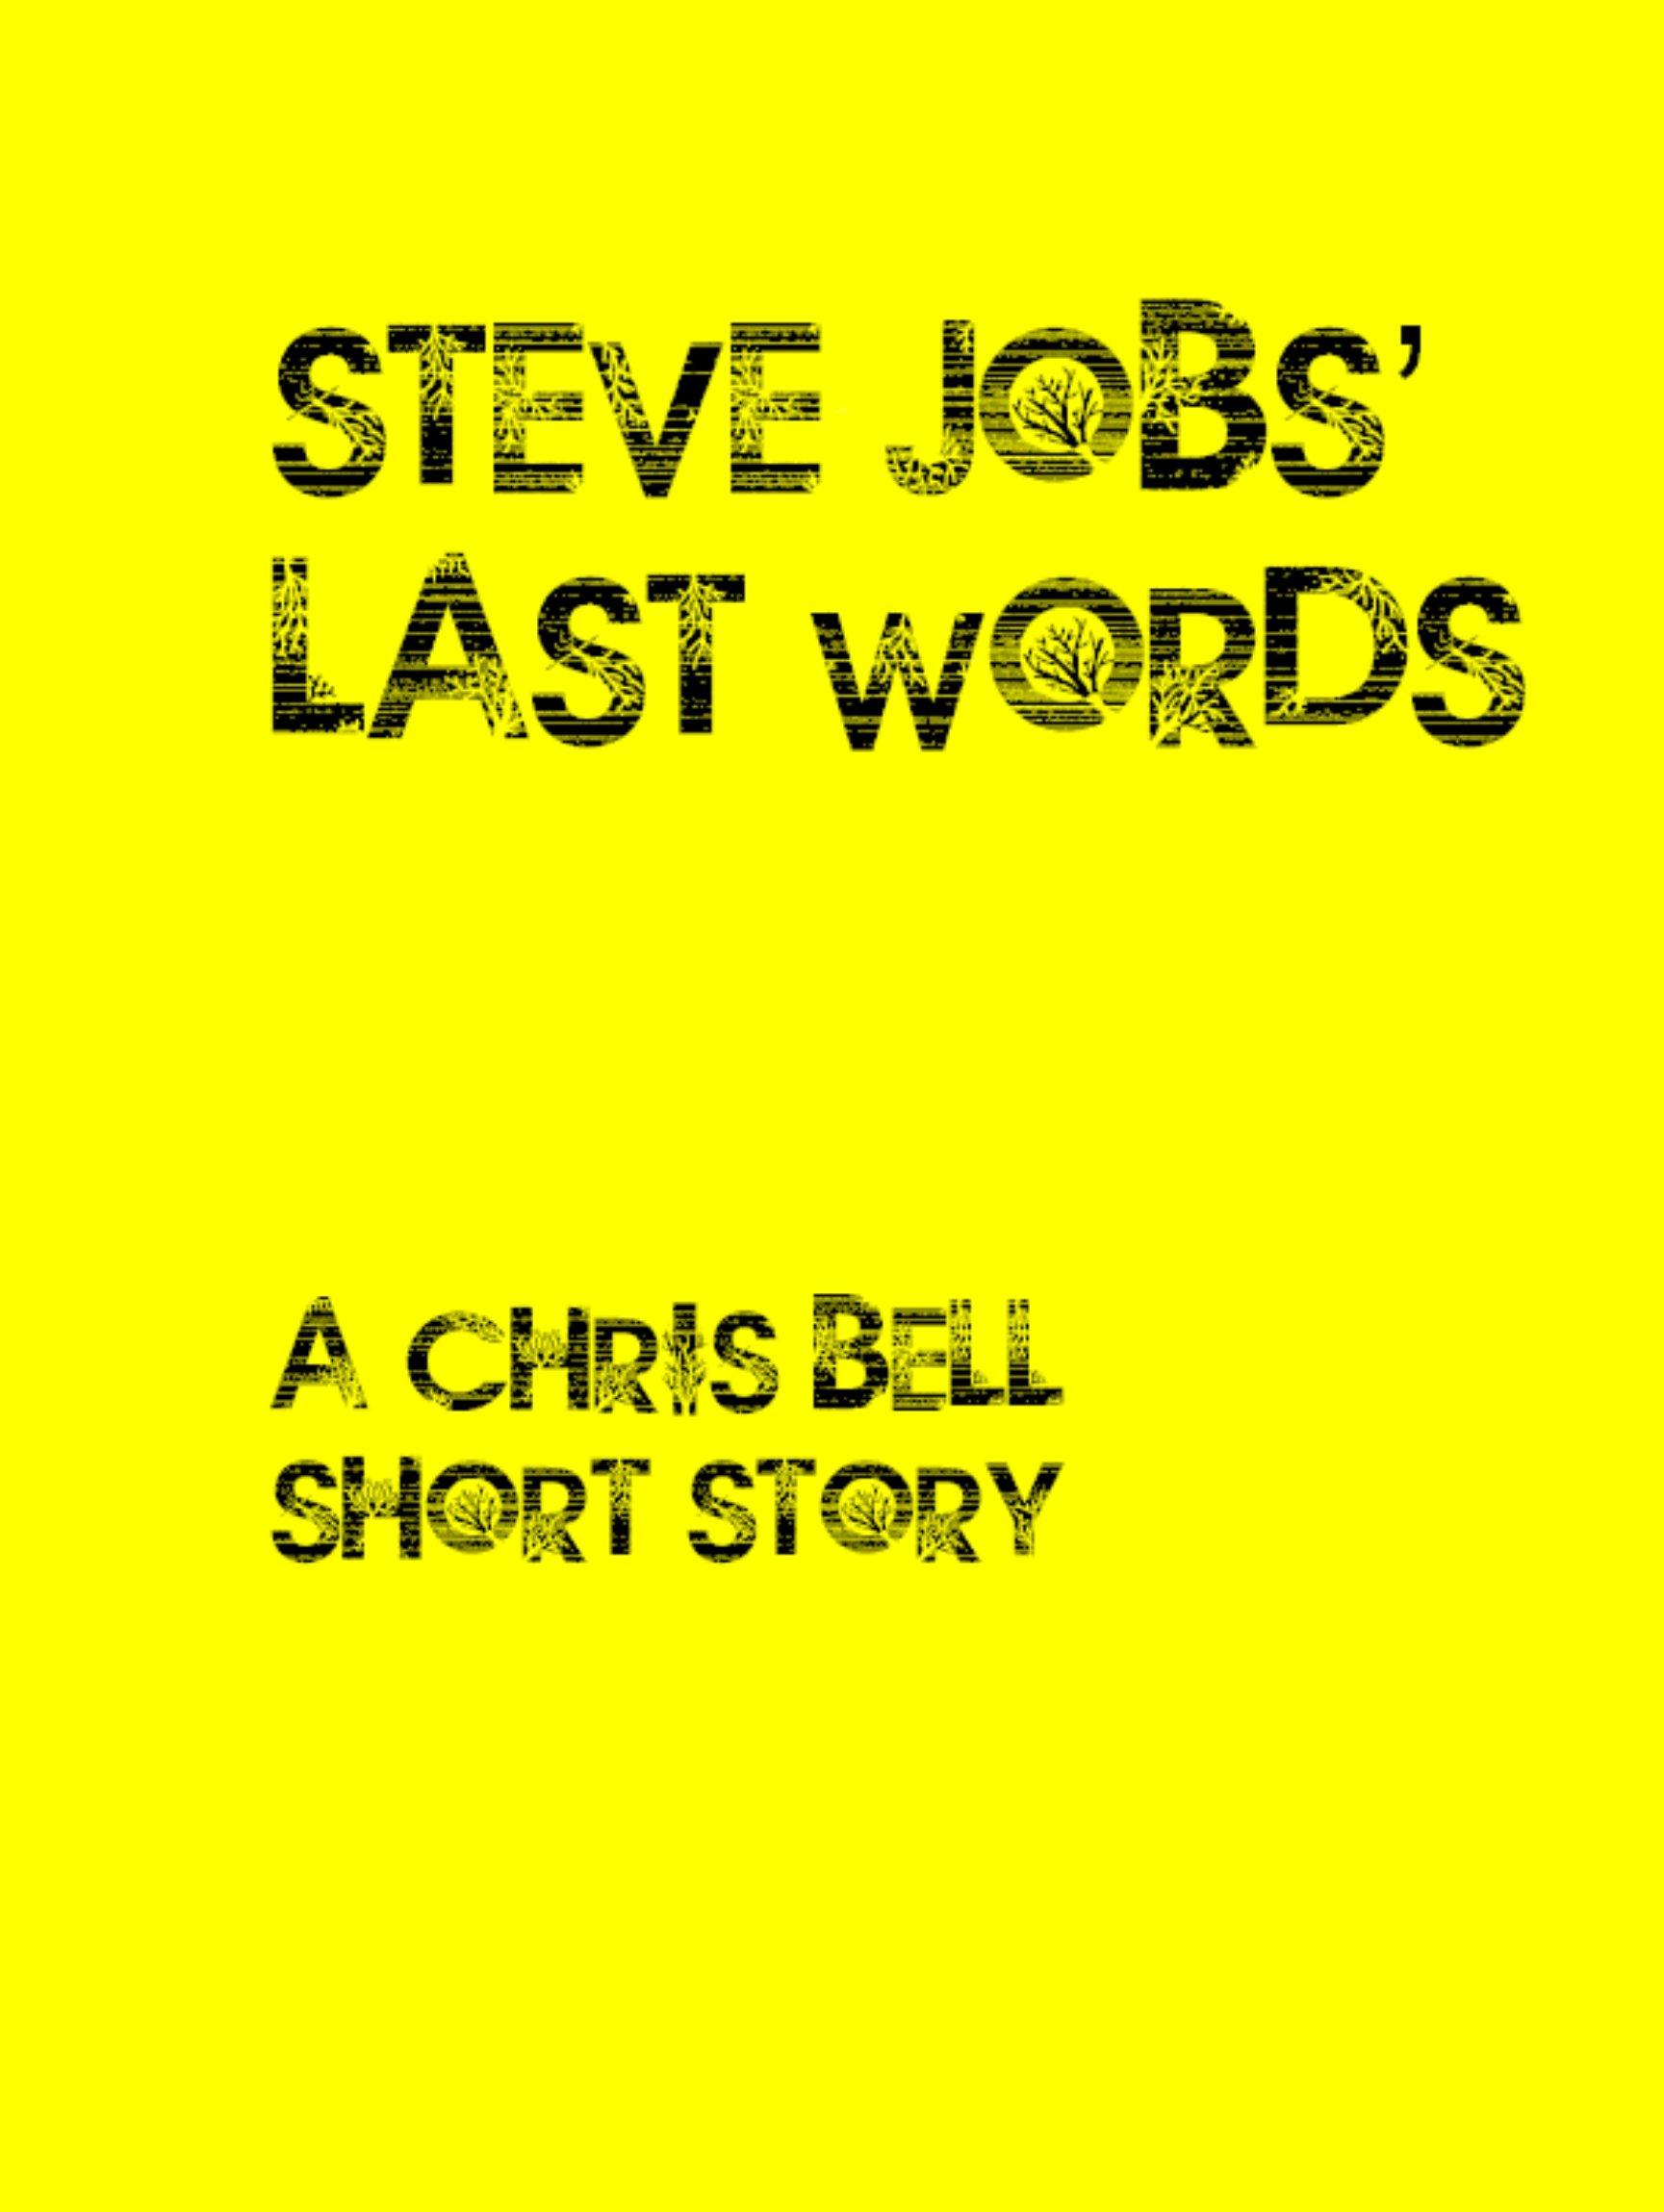 Steve Jobs' last words